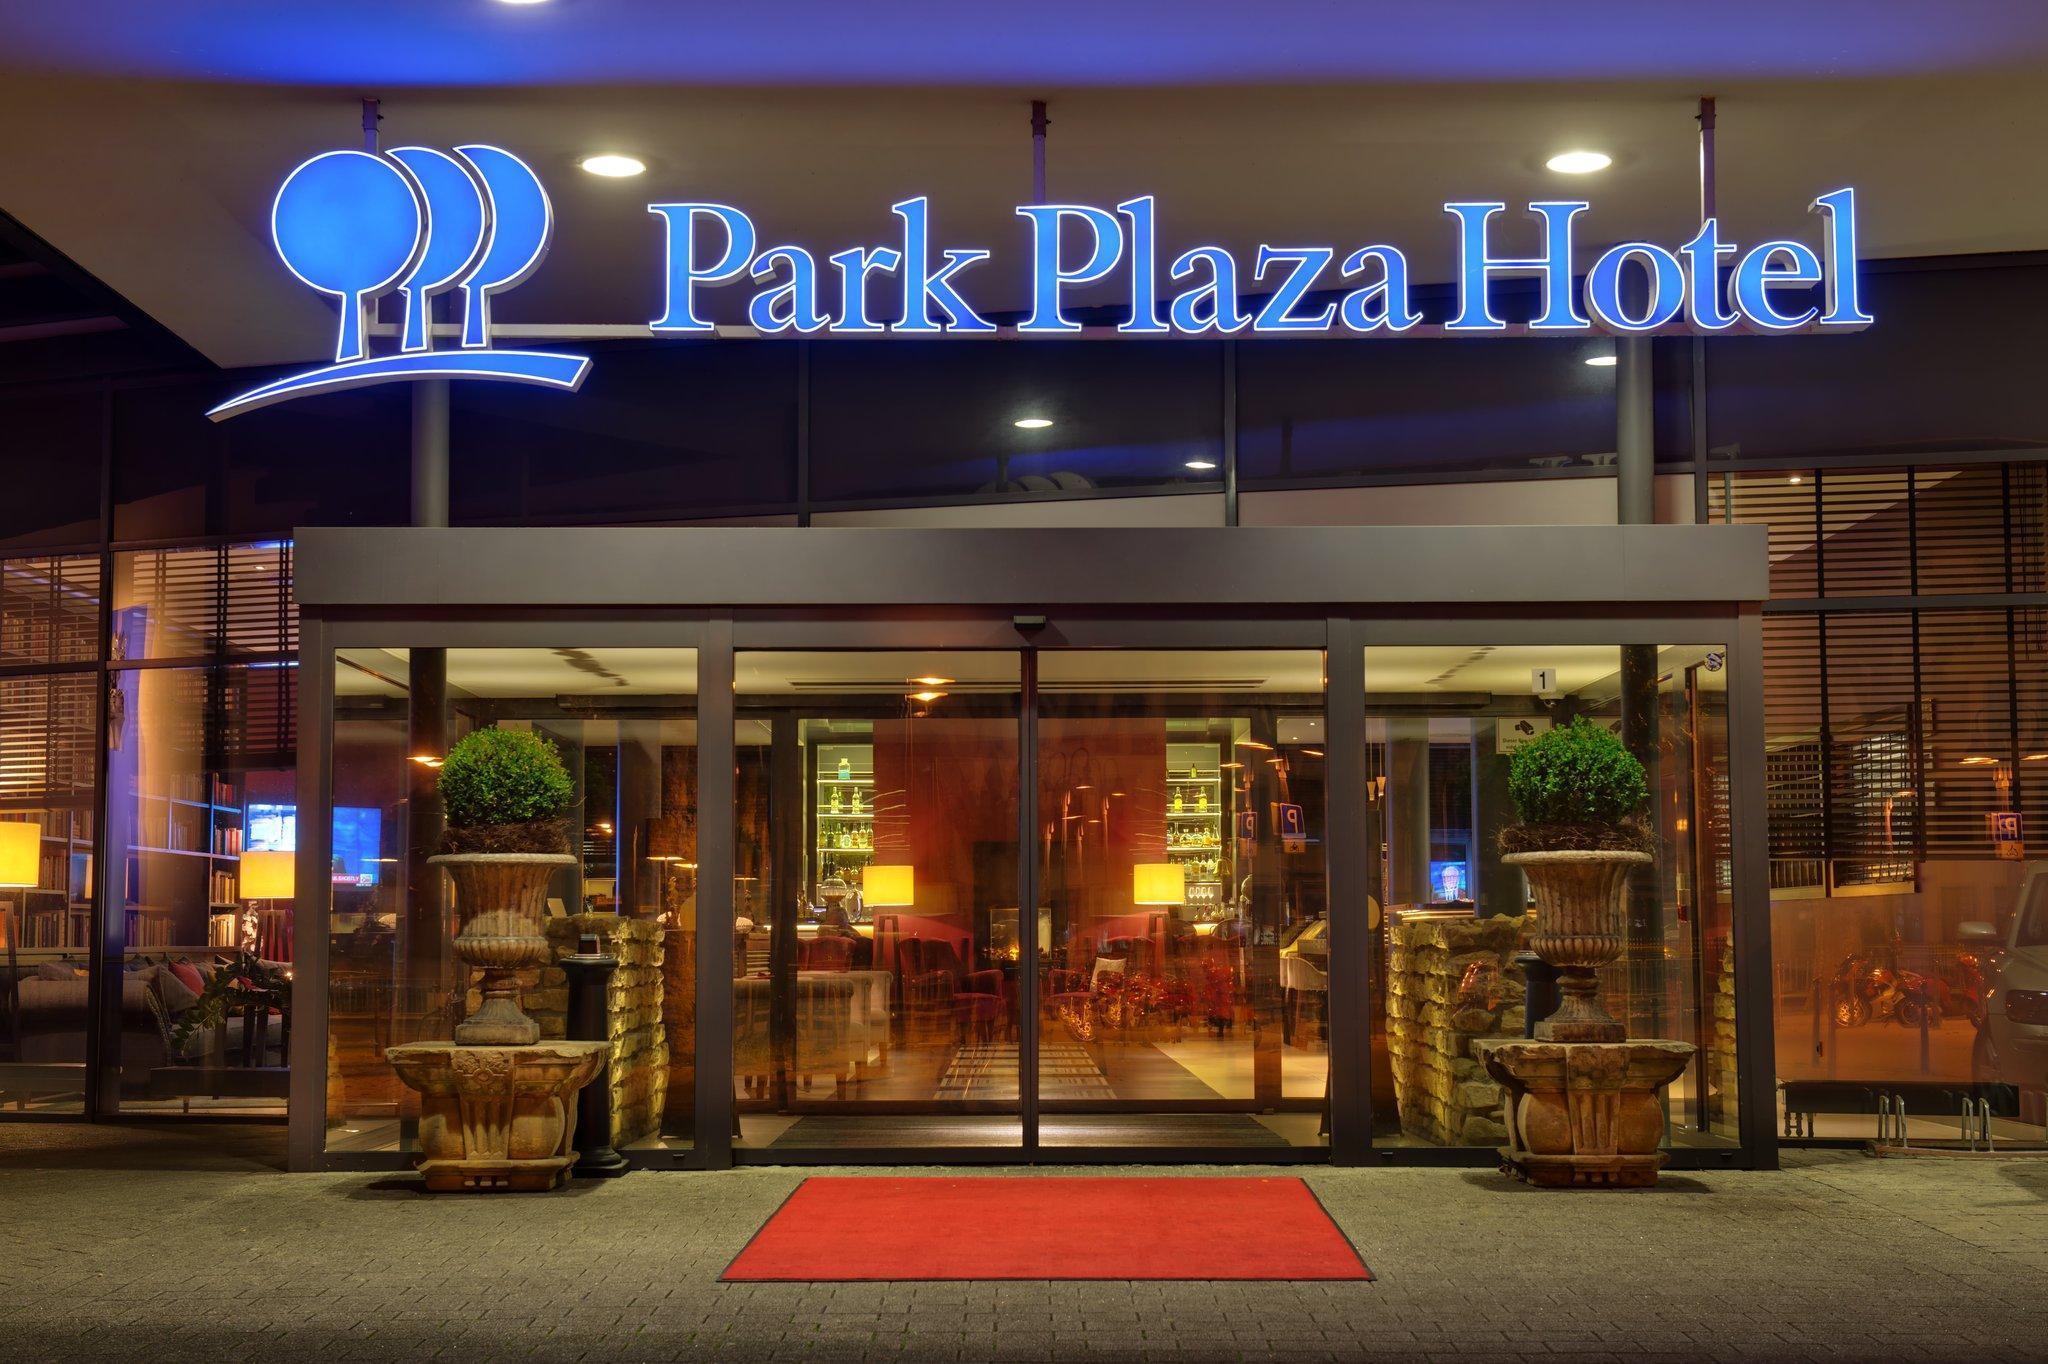 Park Plaza Trier Hotel